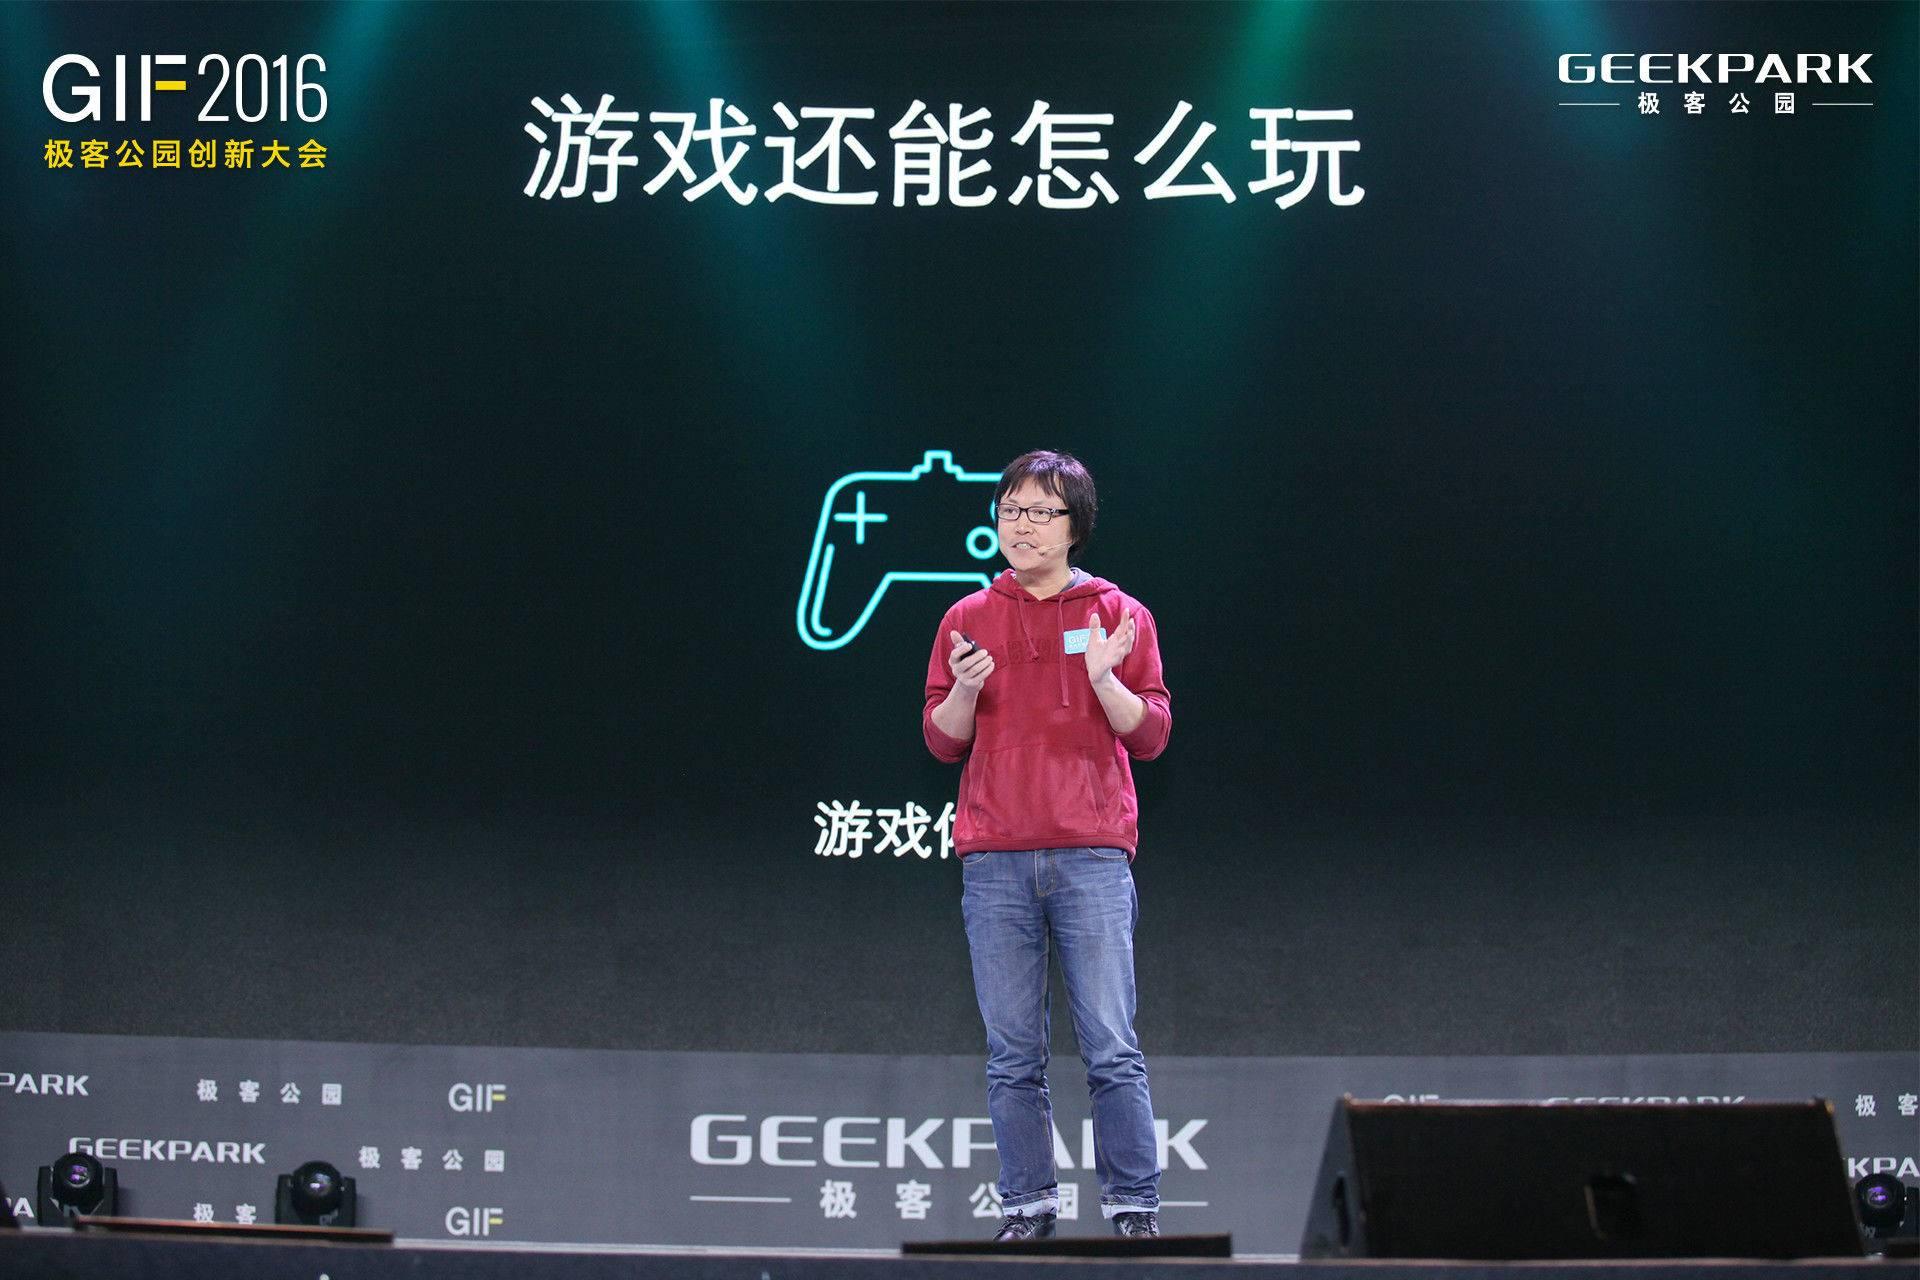 GIF2016011王峰mark0.jpg